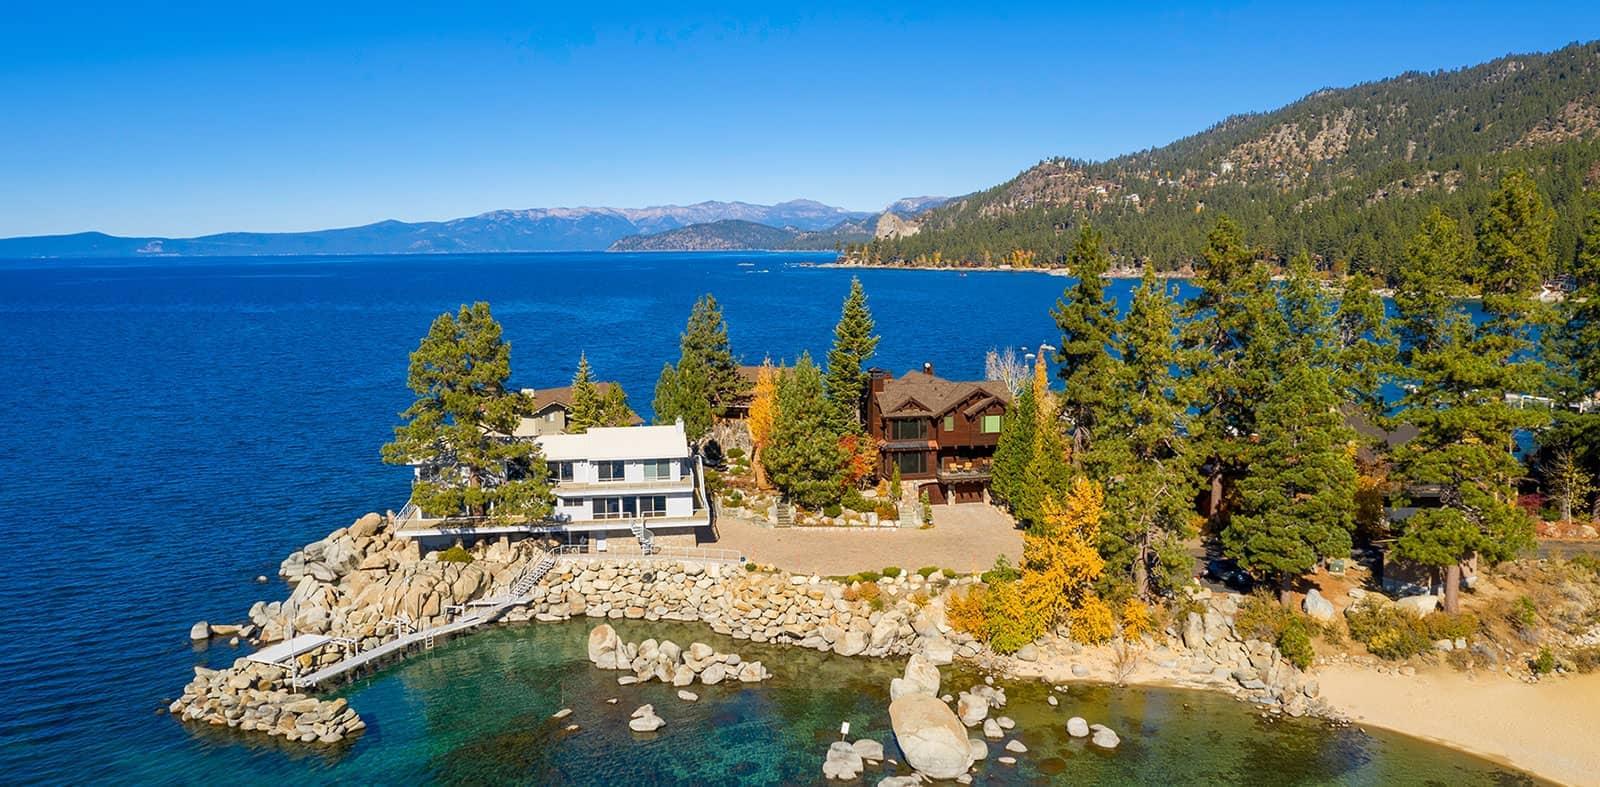 A mordern house near the shore of Lake Tahoe